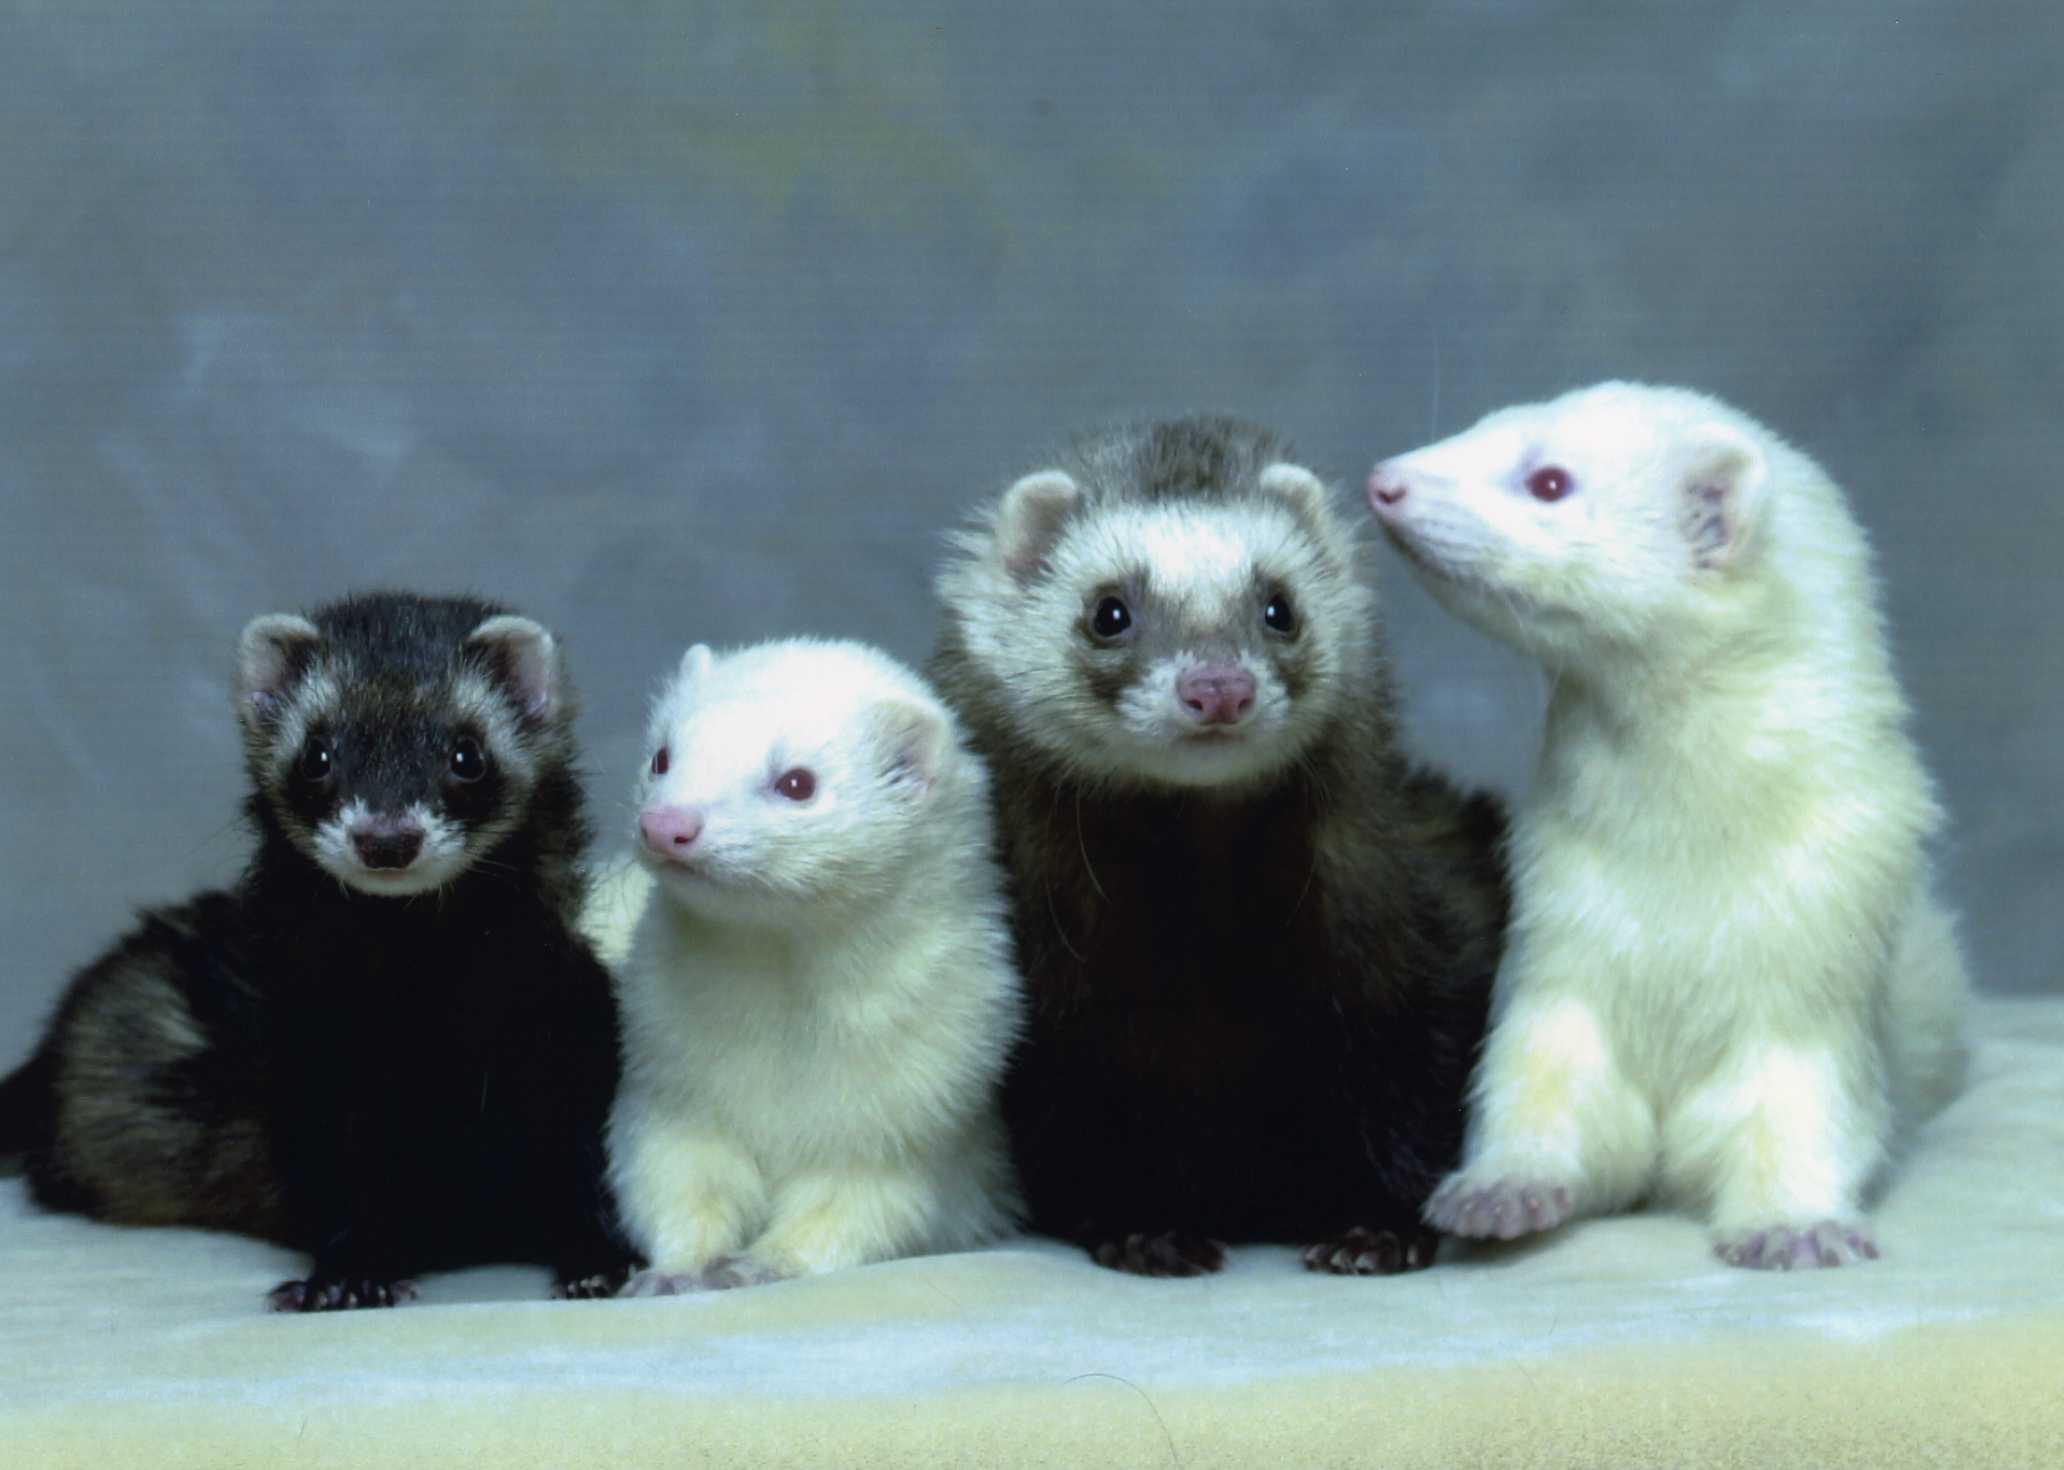 Cute ferrets